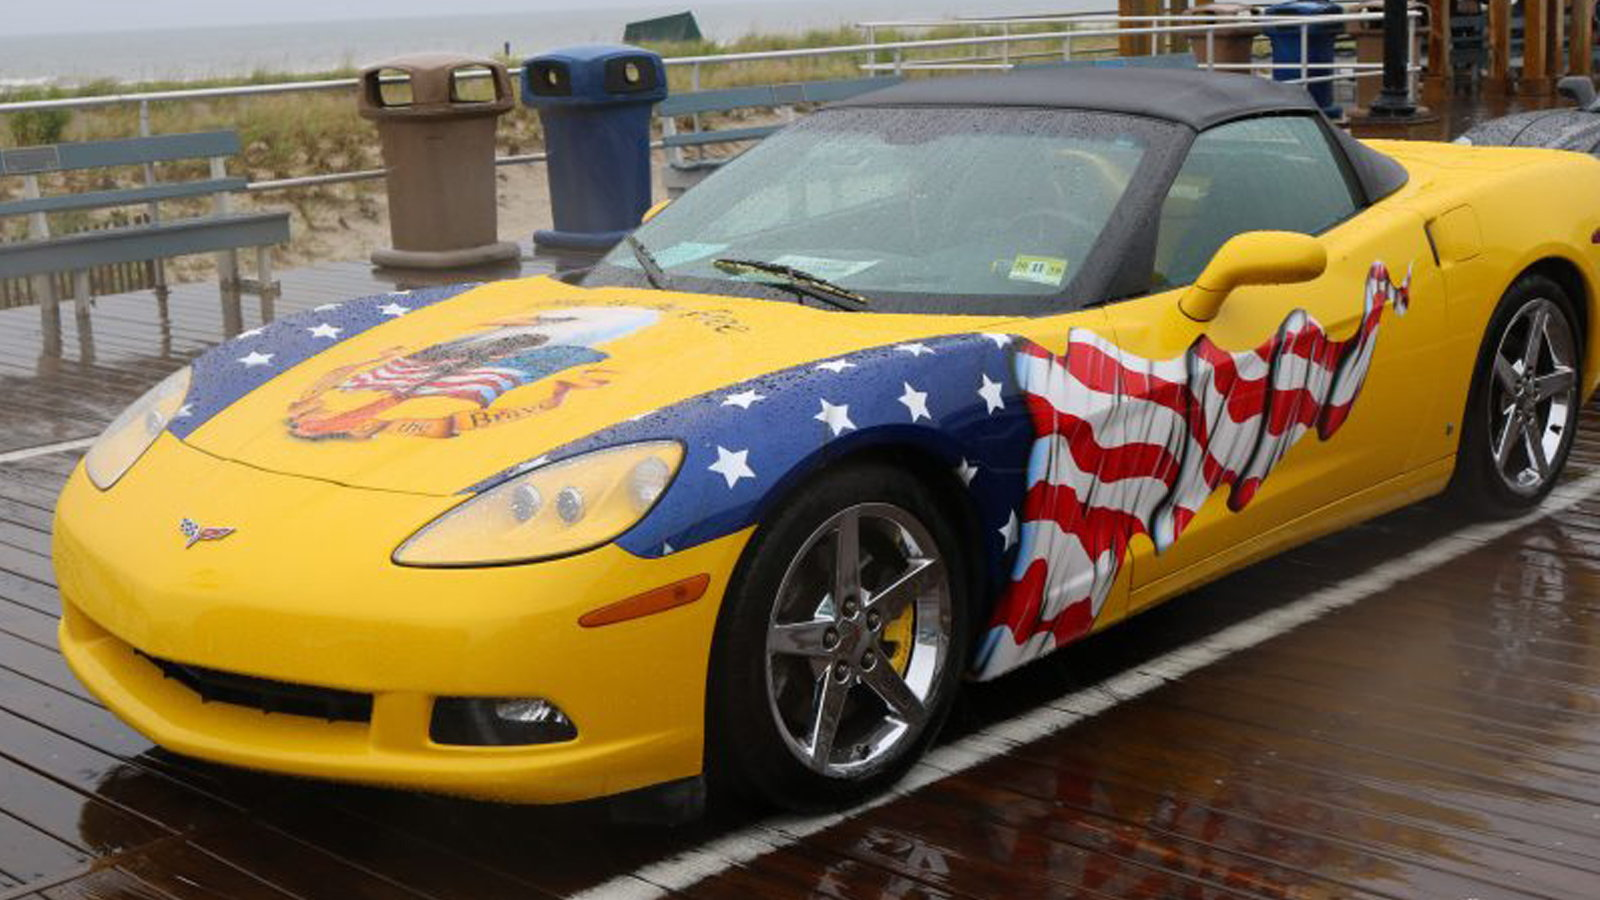 The Rainy Day 2018 Ocean City Corvette Show